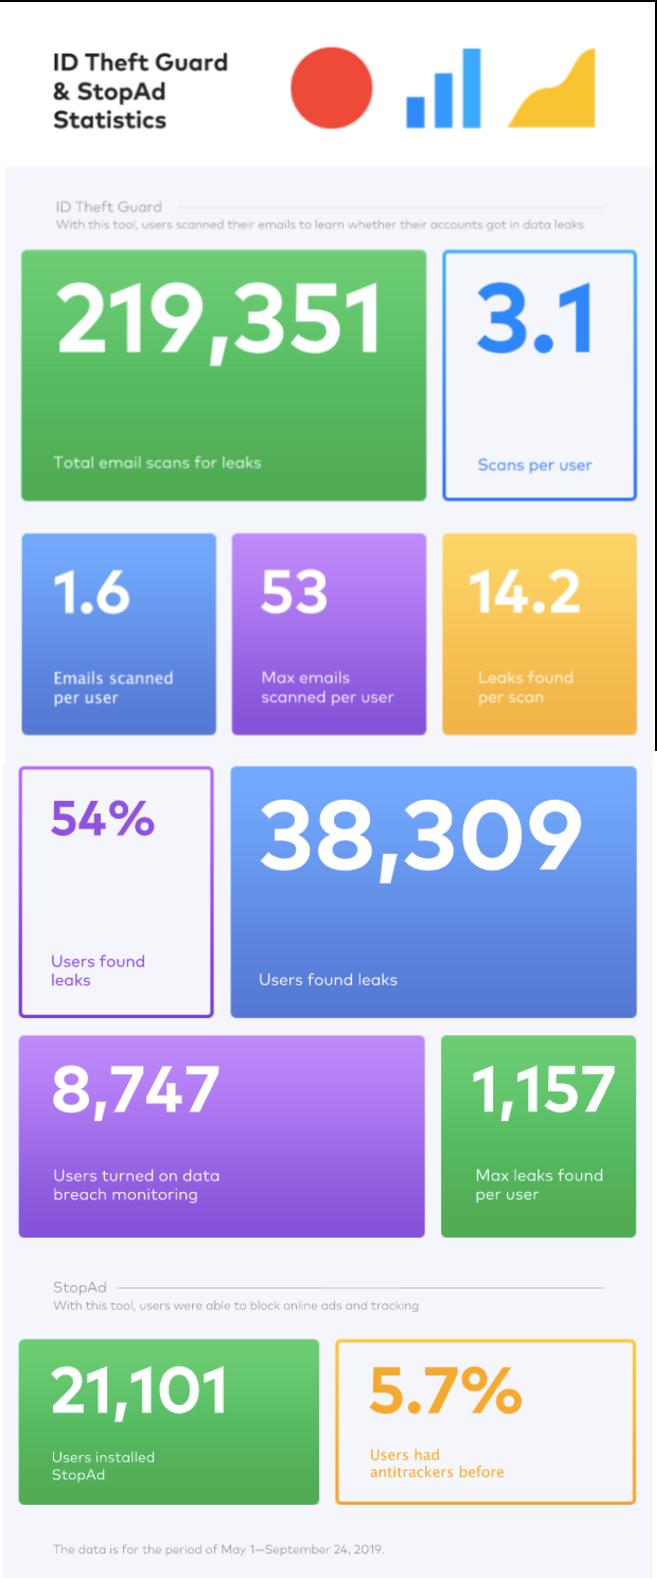 ID Theft Guard and StopAd usage statistics